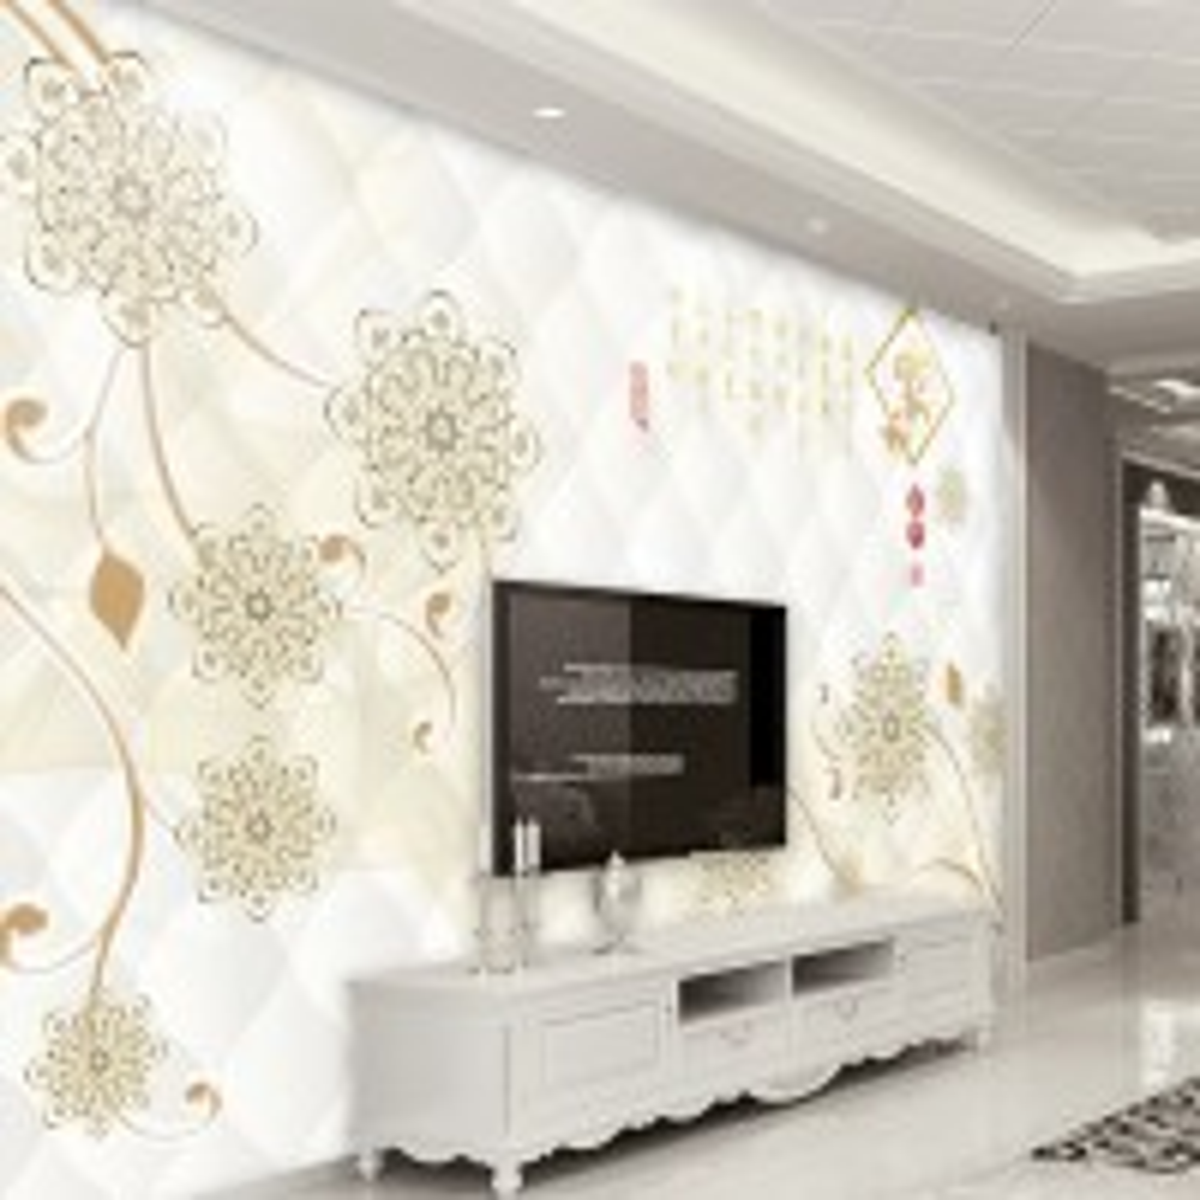 Diamond Flower with Damask Pattern Wallpaper Mural